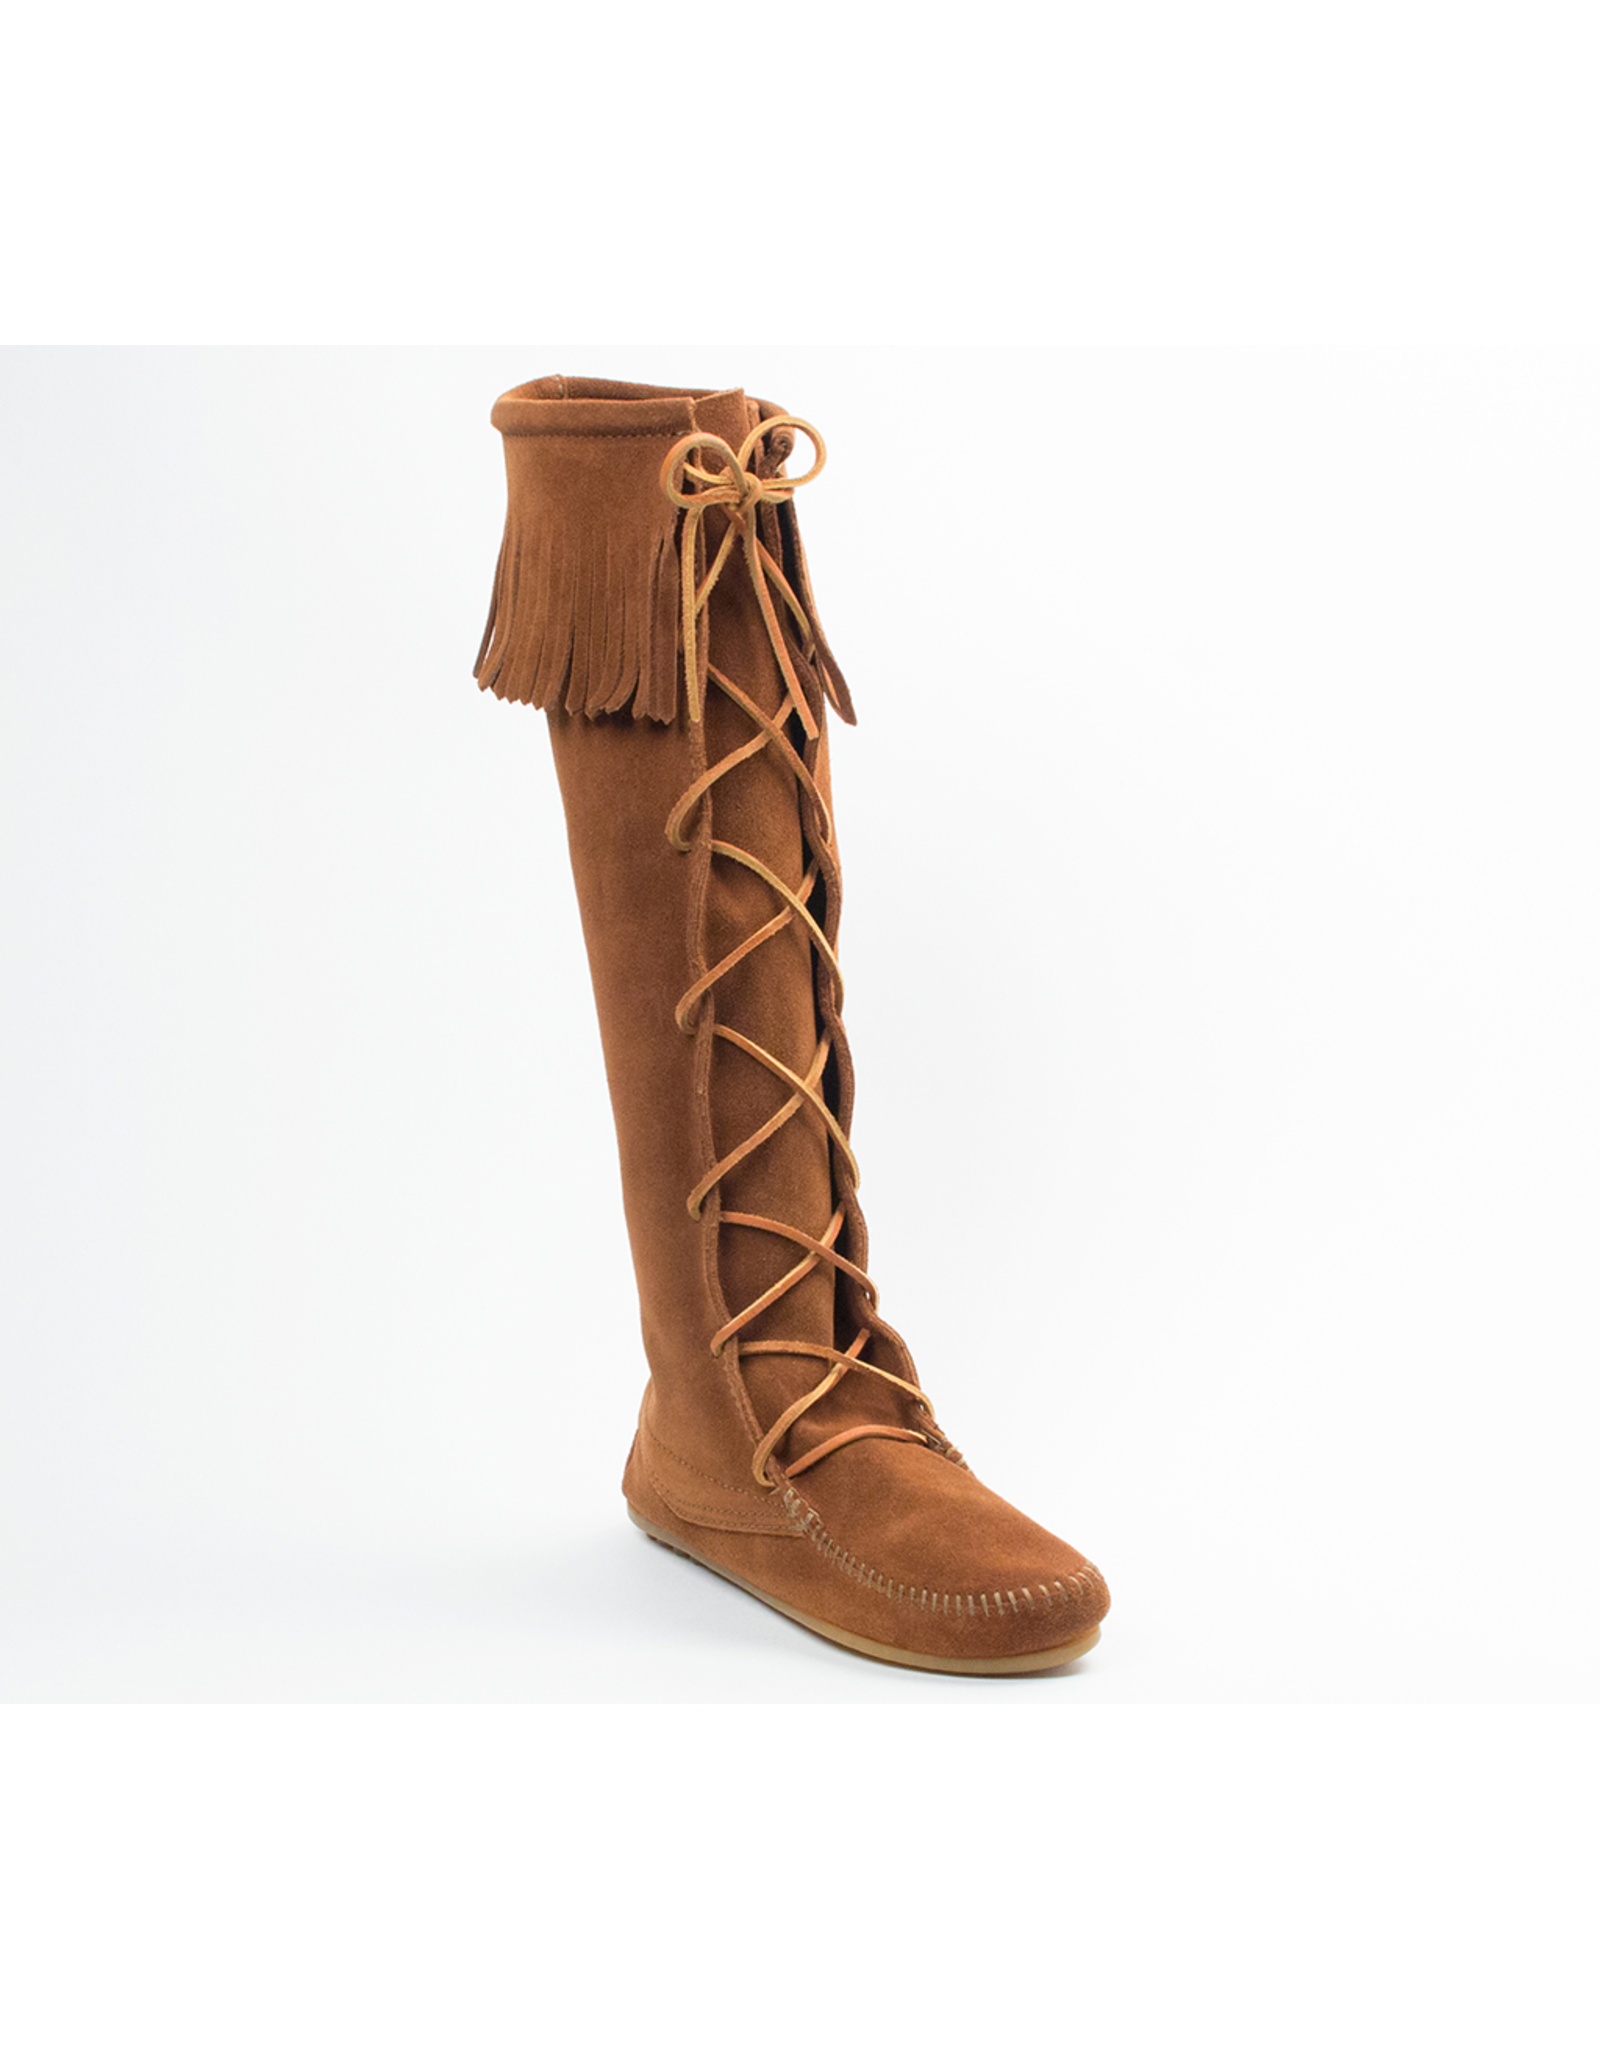 Minnetonka Front Lace Hard Sole Knee Hi Boot - COV520